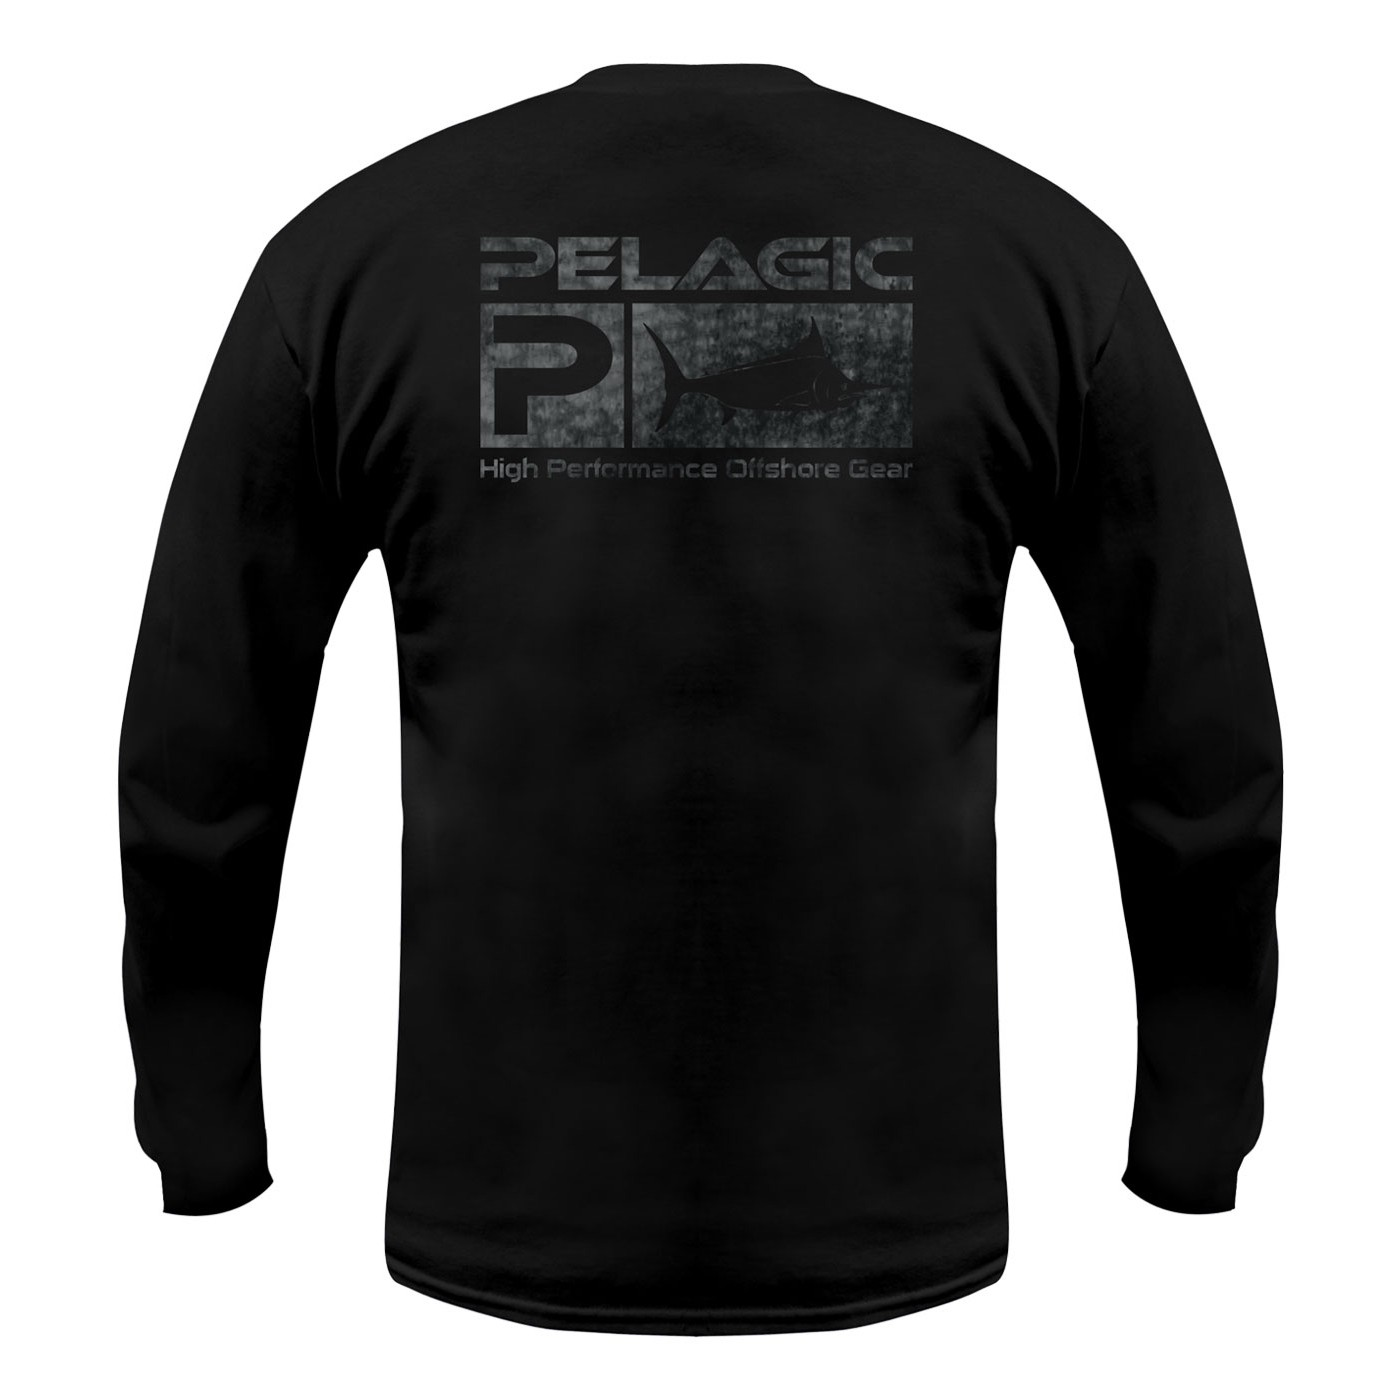 Pelagic Deluxe Logo Pattern Long-Sleeved Tee